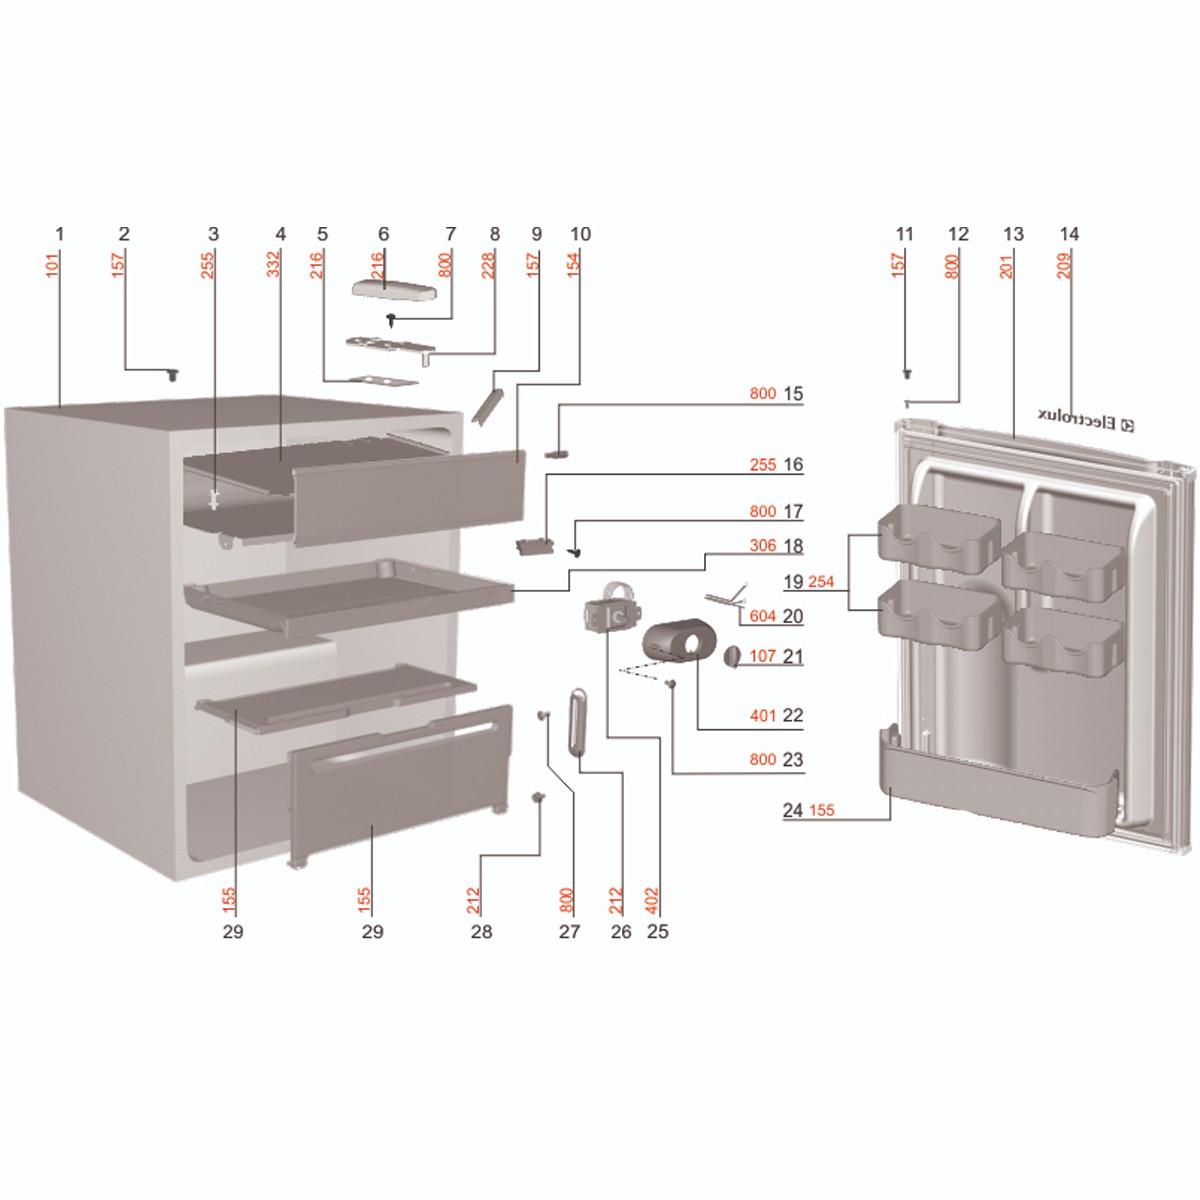 Termostato Frigobar Electrolux Re80 Re120 - A06328501